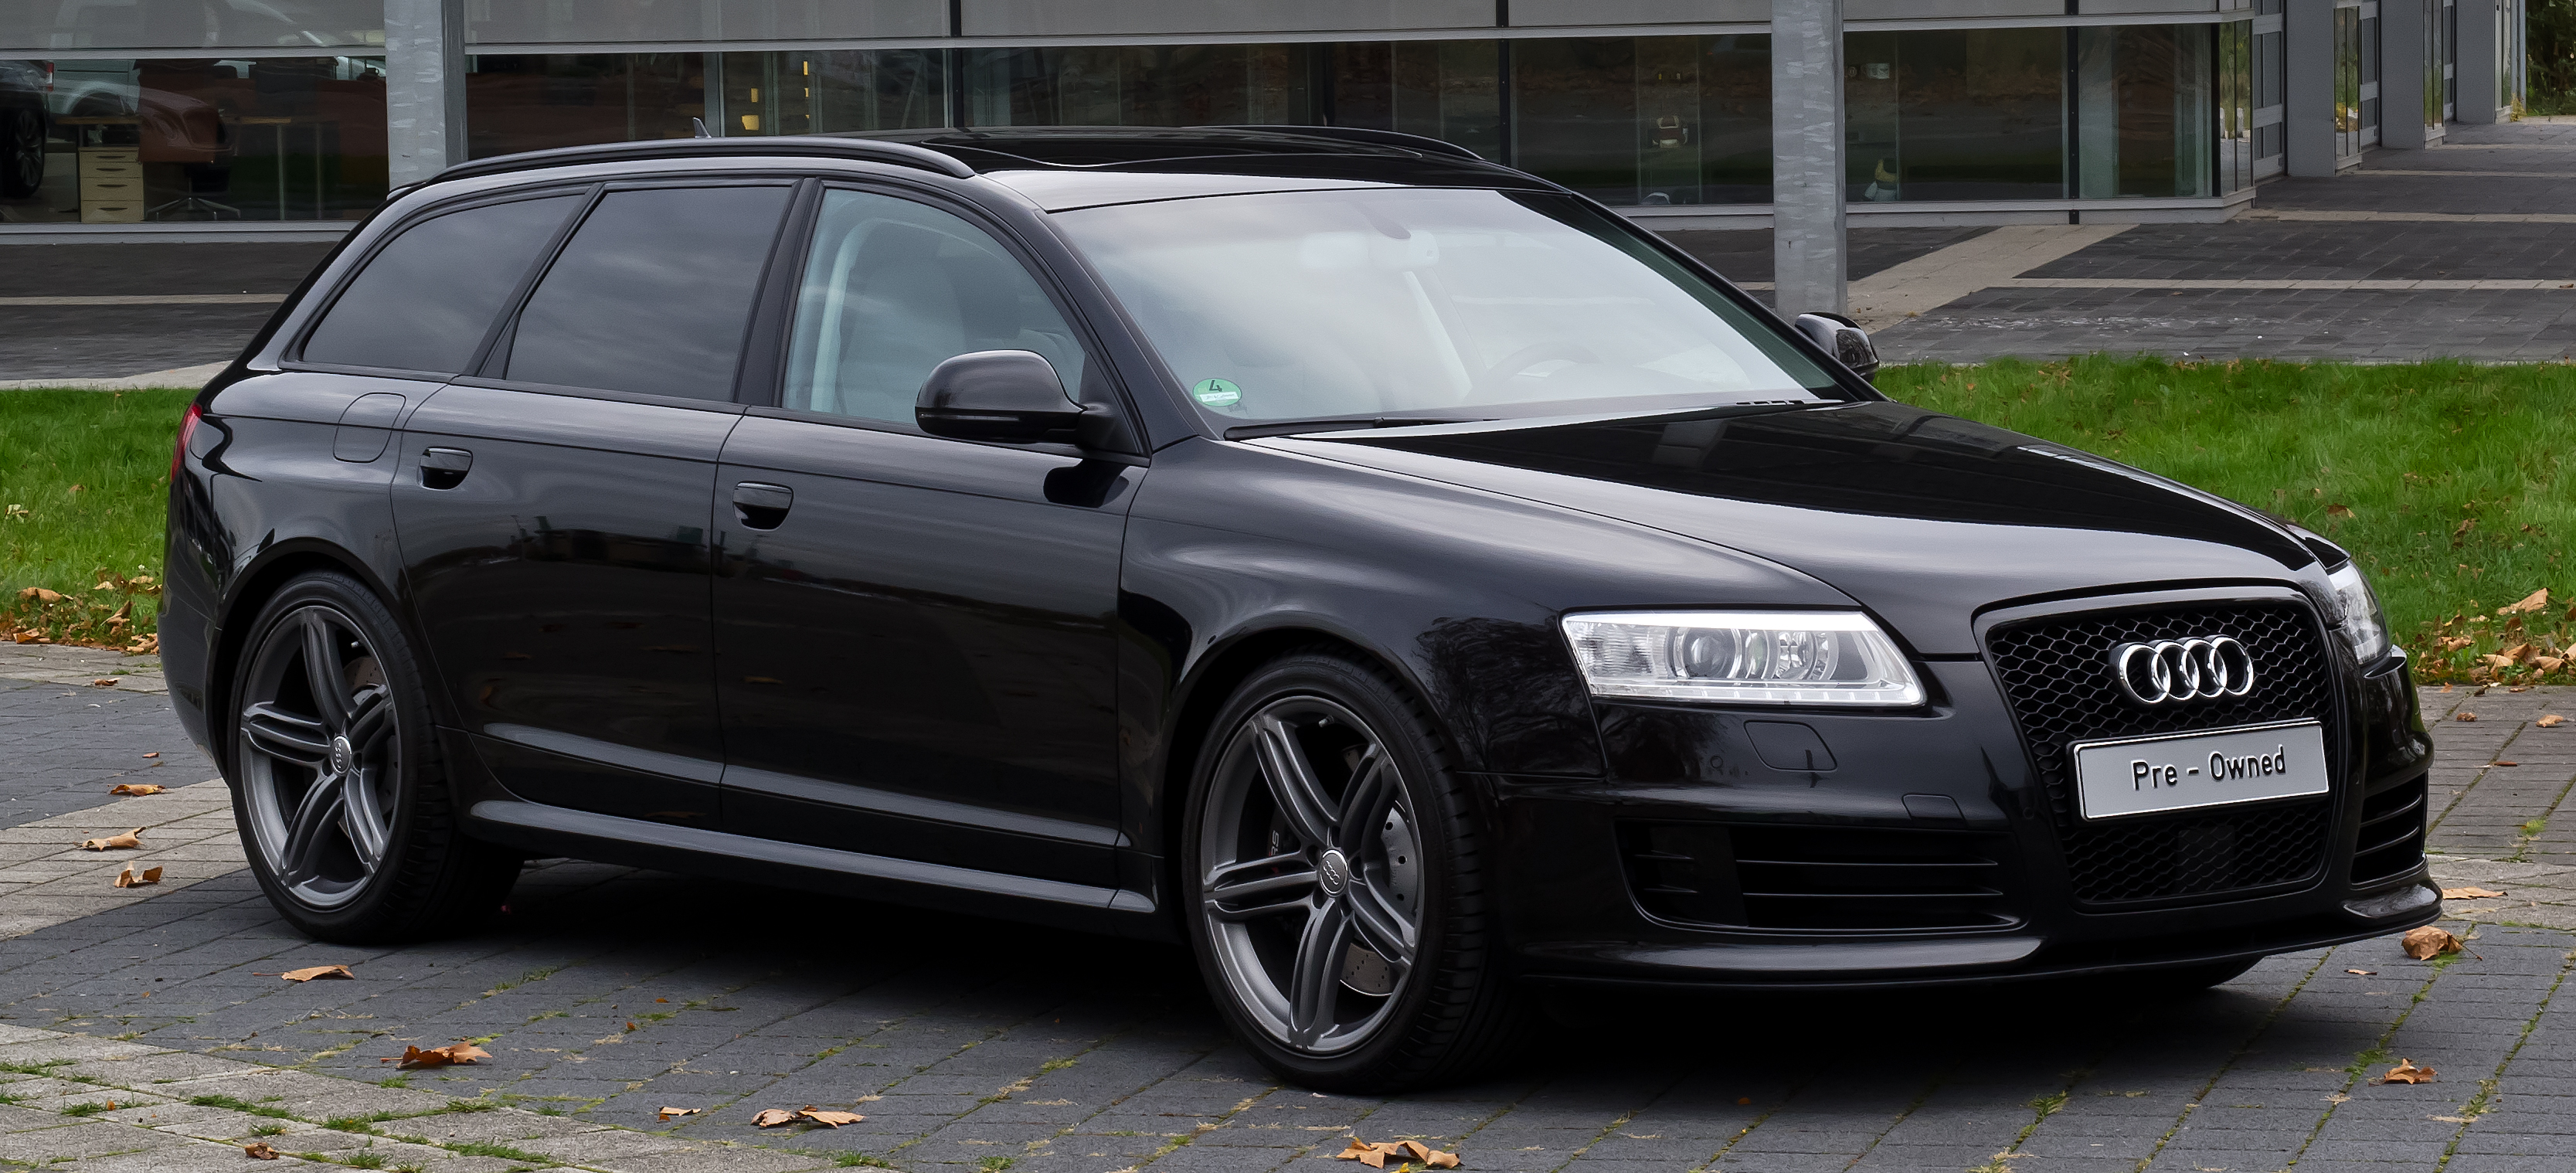 File Audi Rs 6 Avant C6 Frontansicht 1 26 Oktober